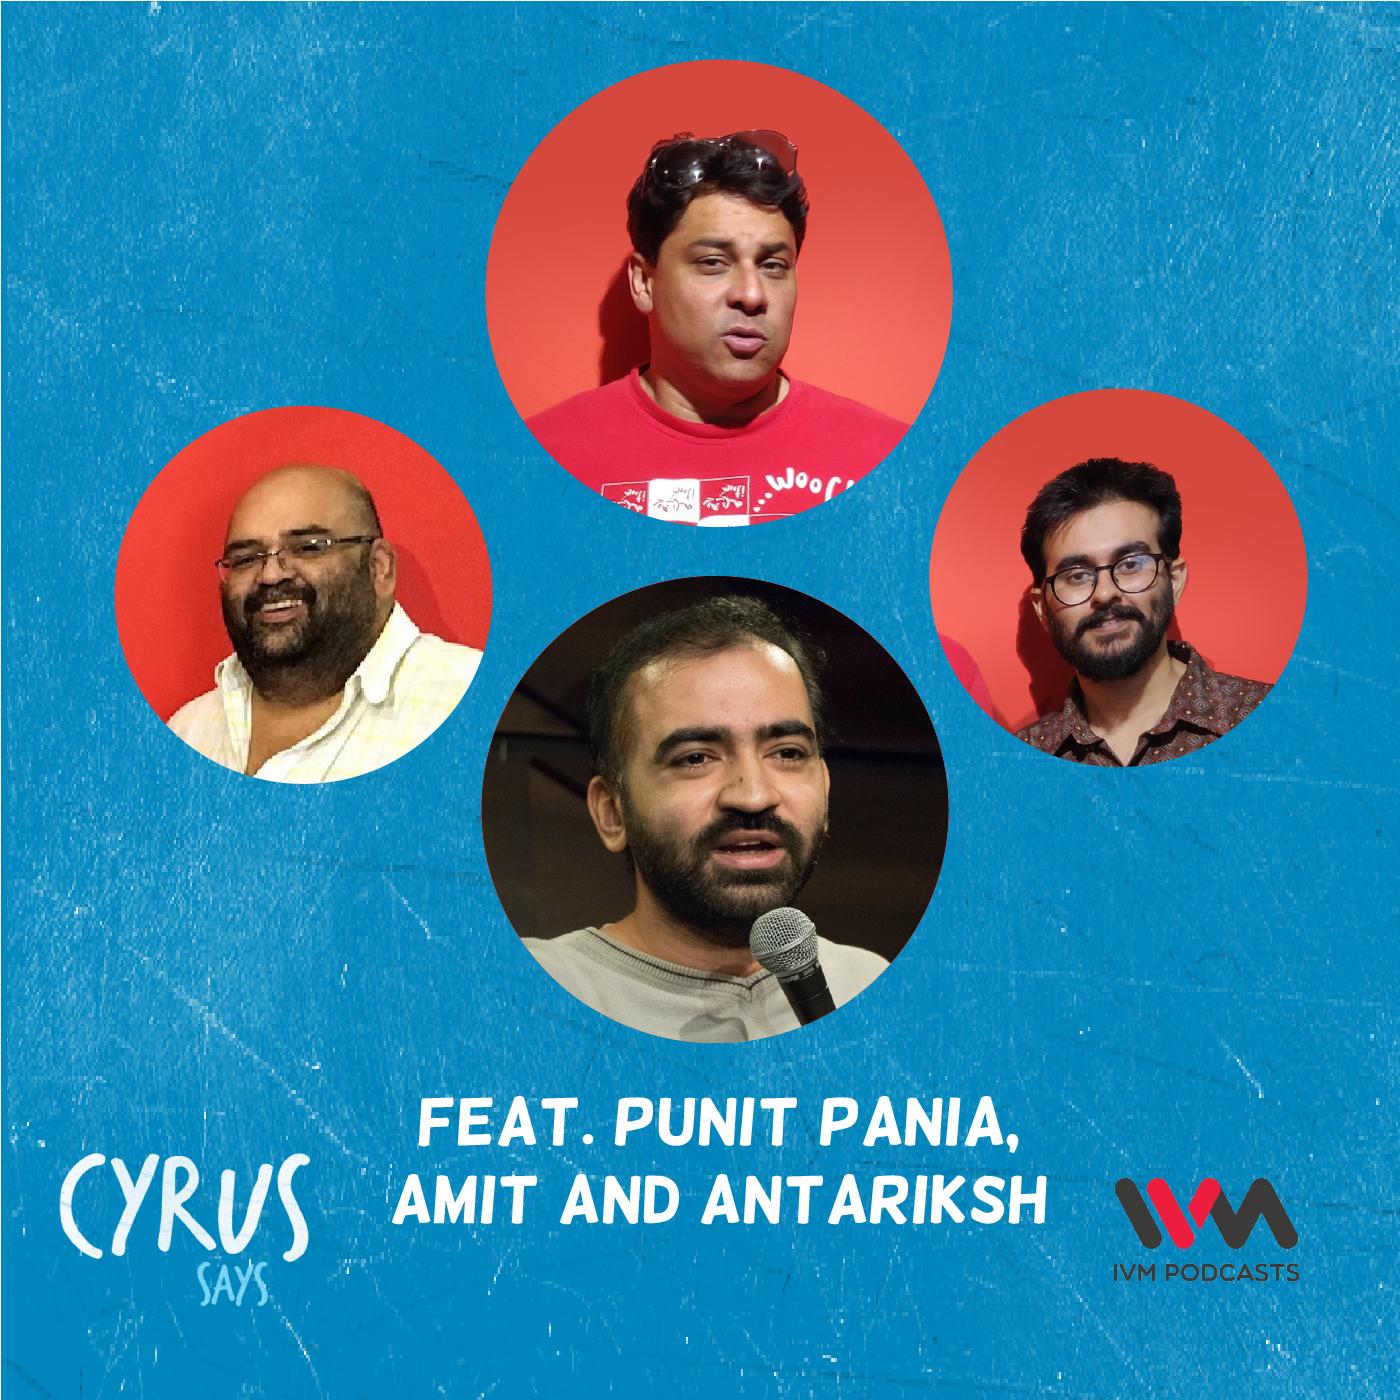 Ep. 602: feat. Punit Pania, Amit and Antariksh